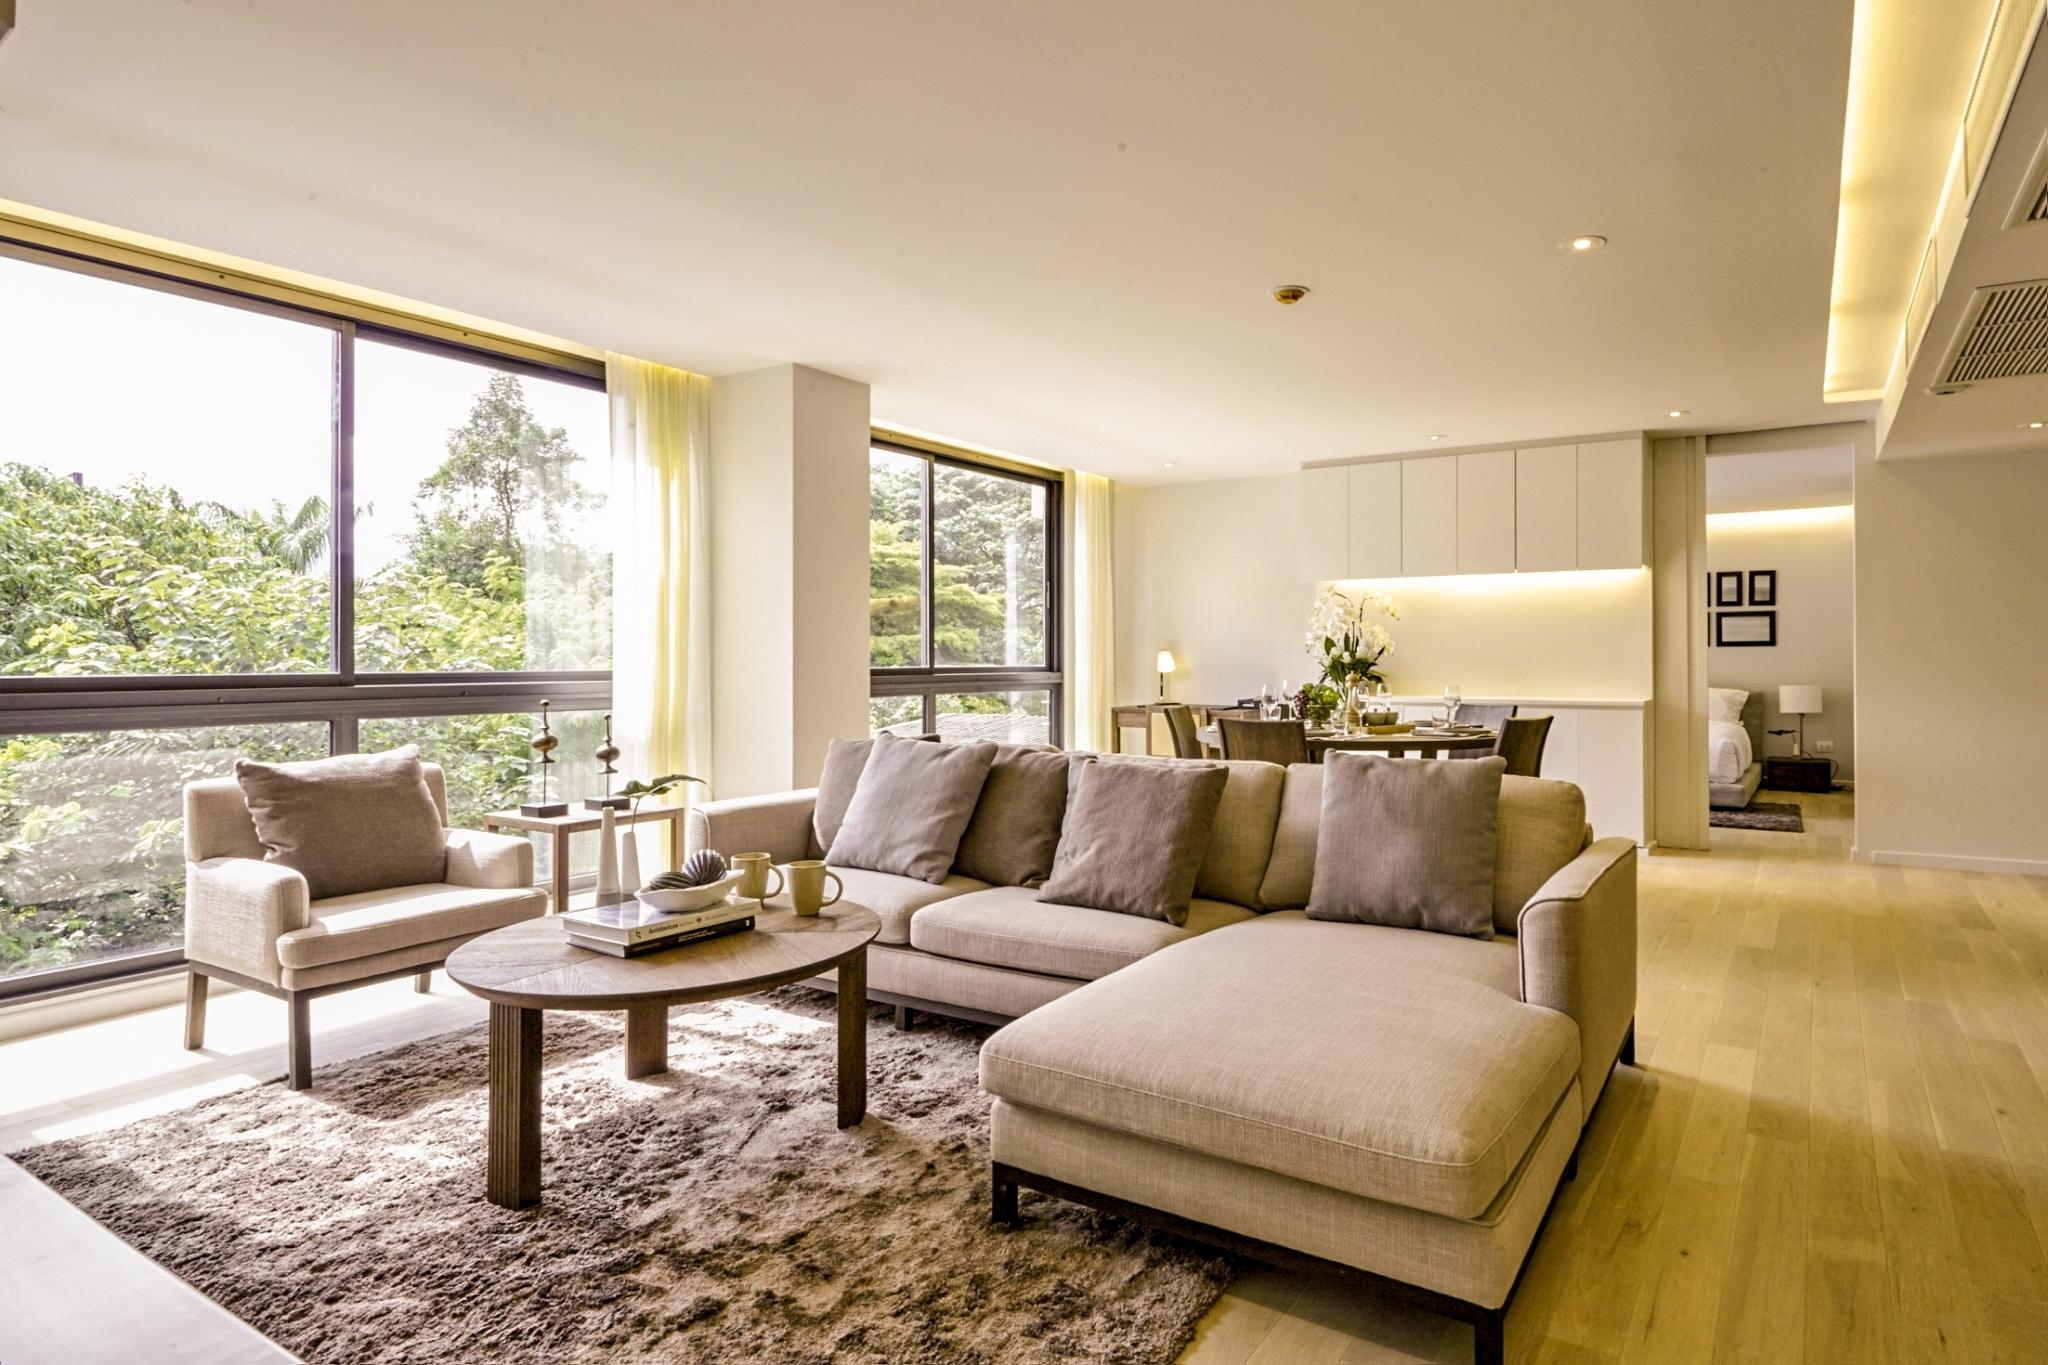 Luxury Fully Furnished 2 Bedroom In Peaks Avenue Condominium